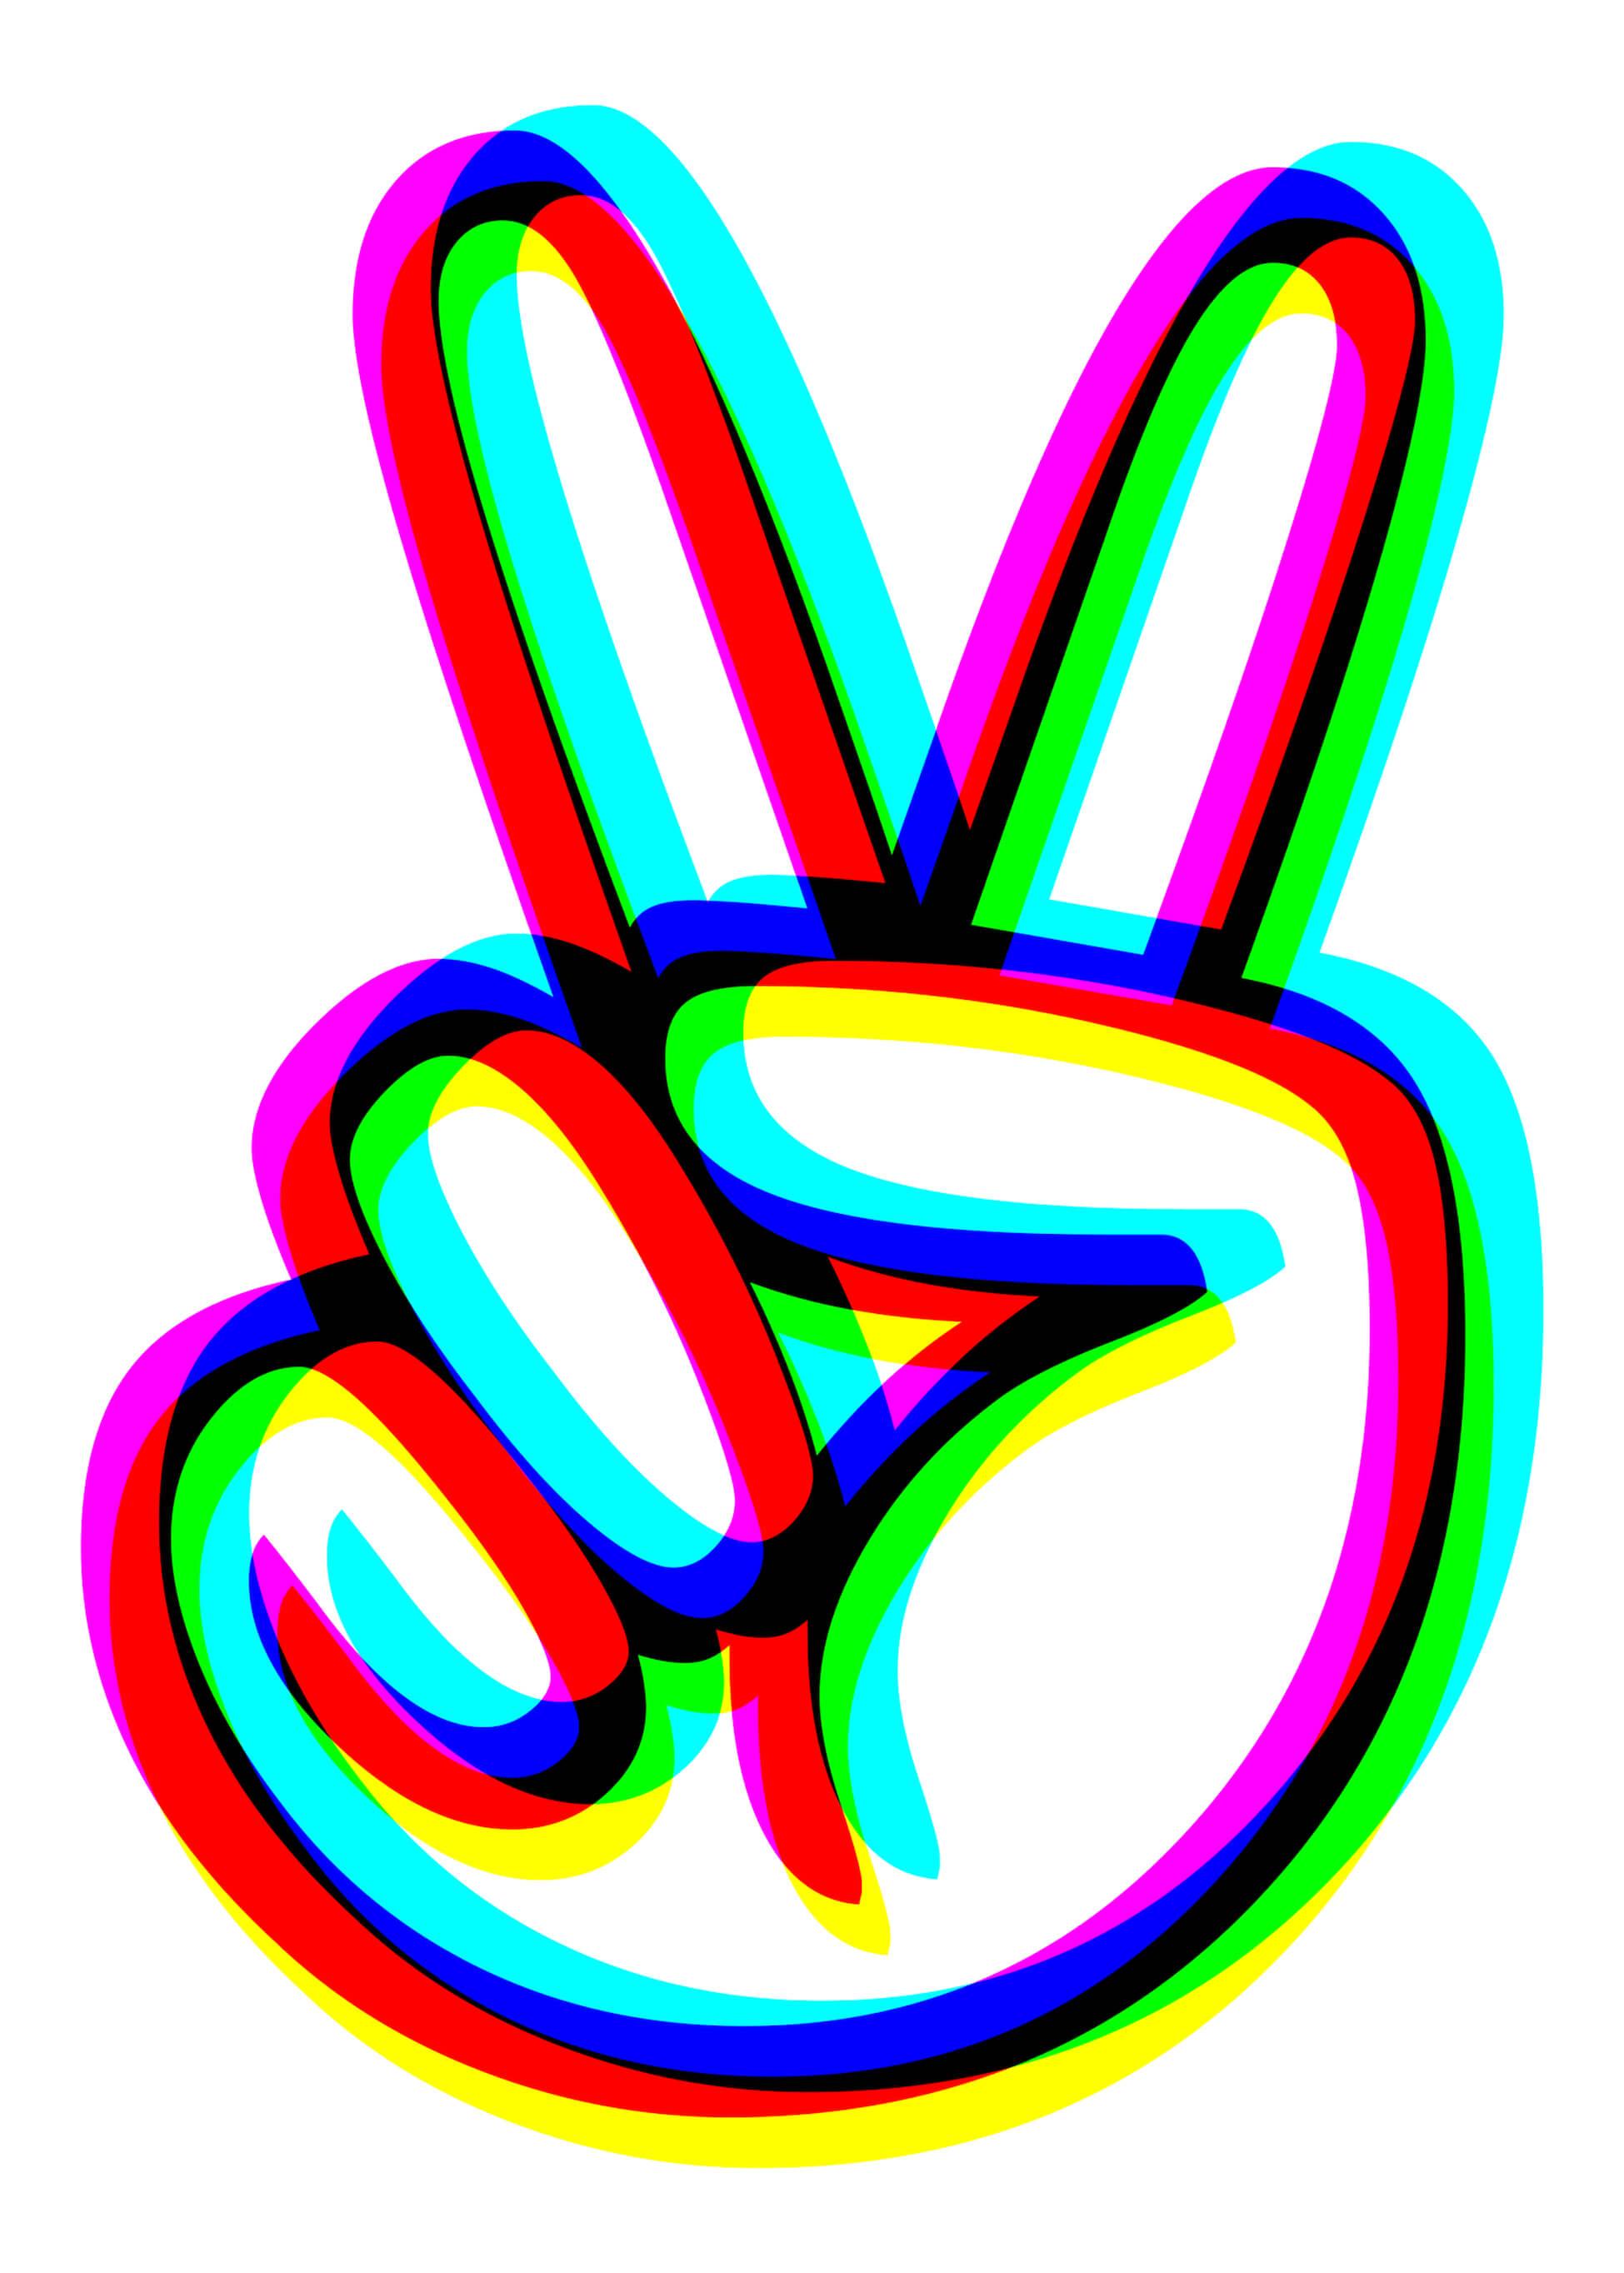 Focus On Peace main image